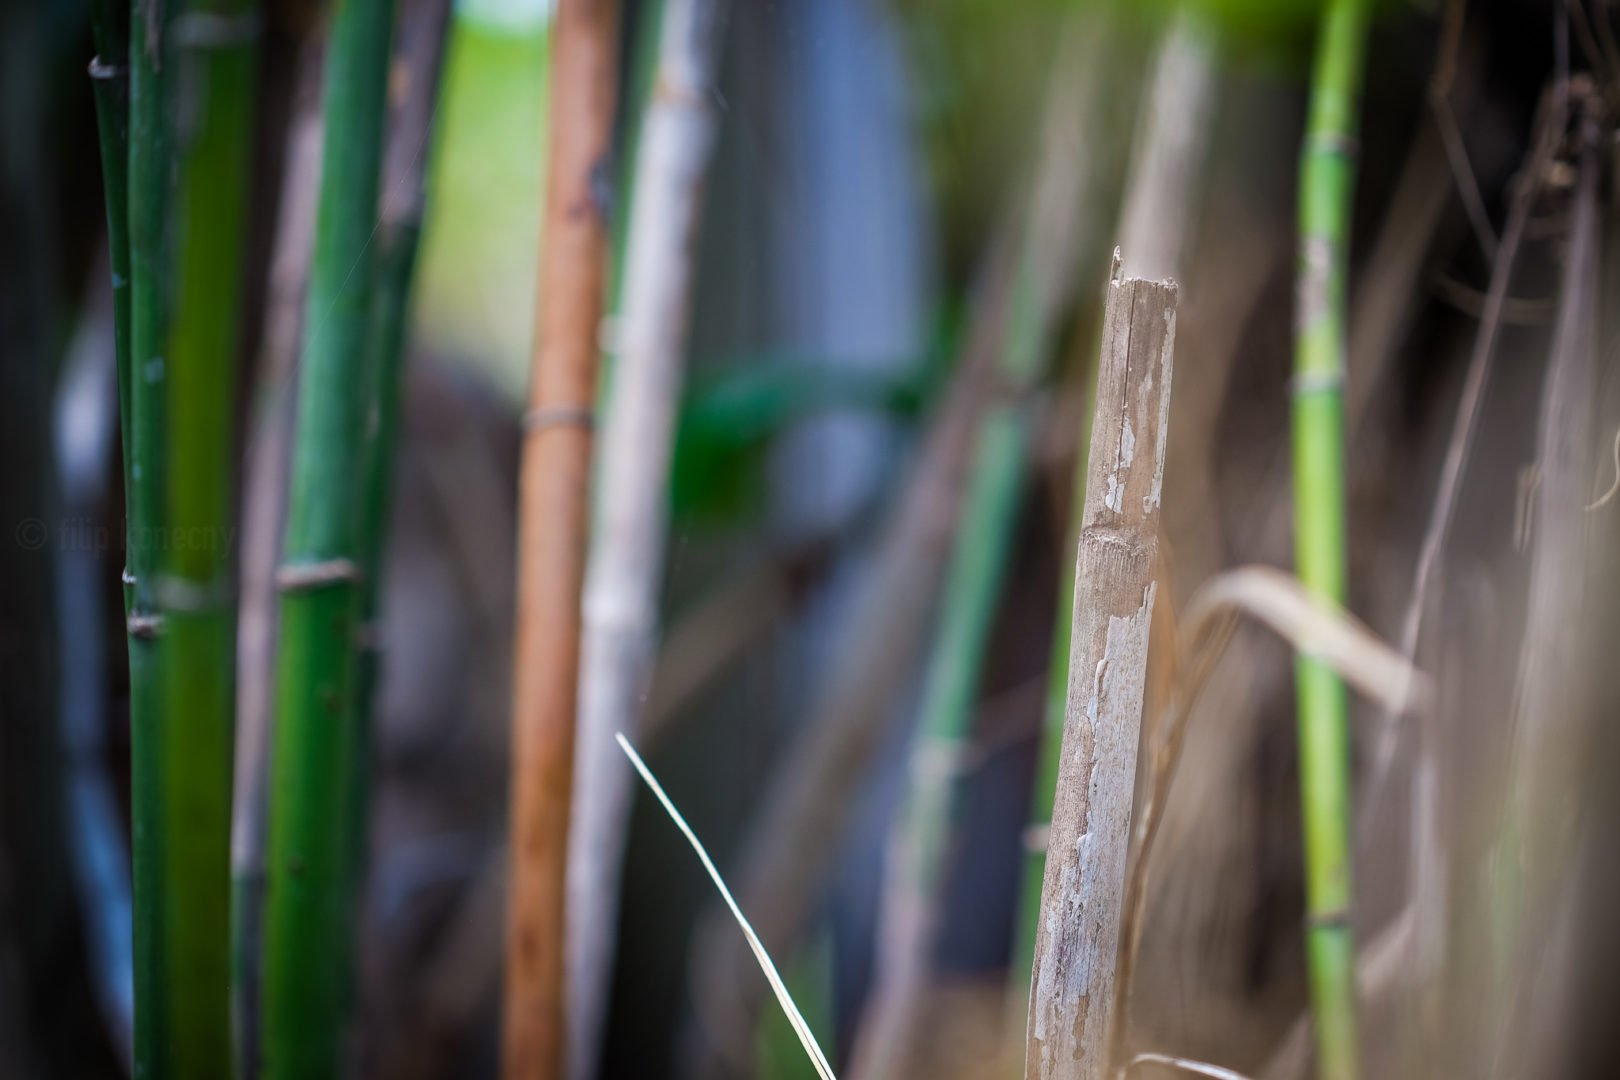 some bamboo shots